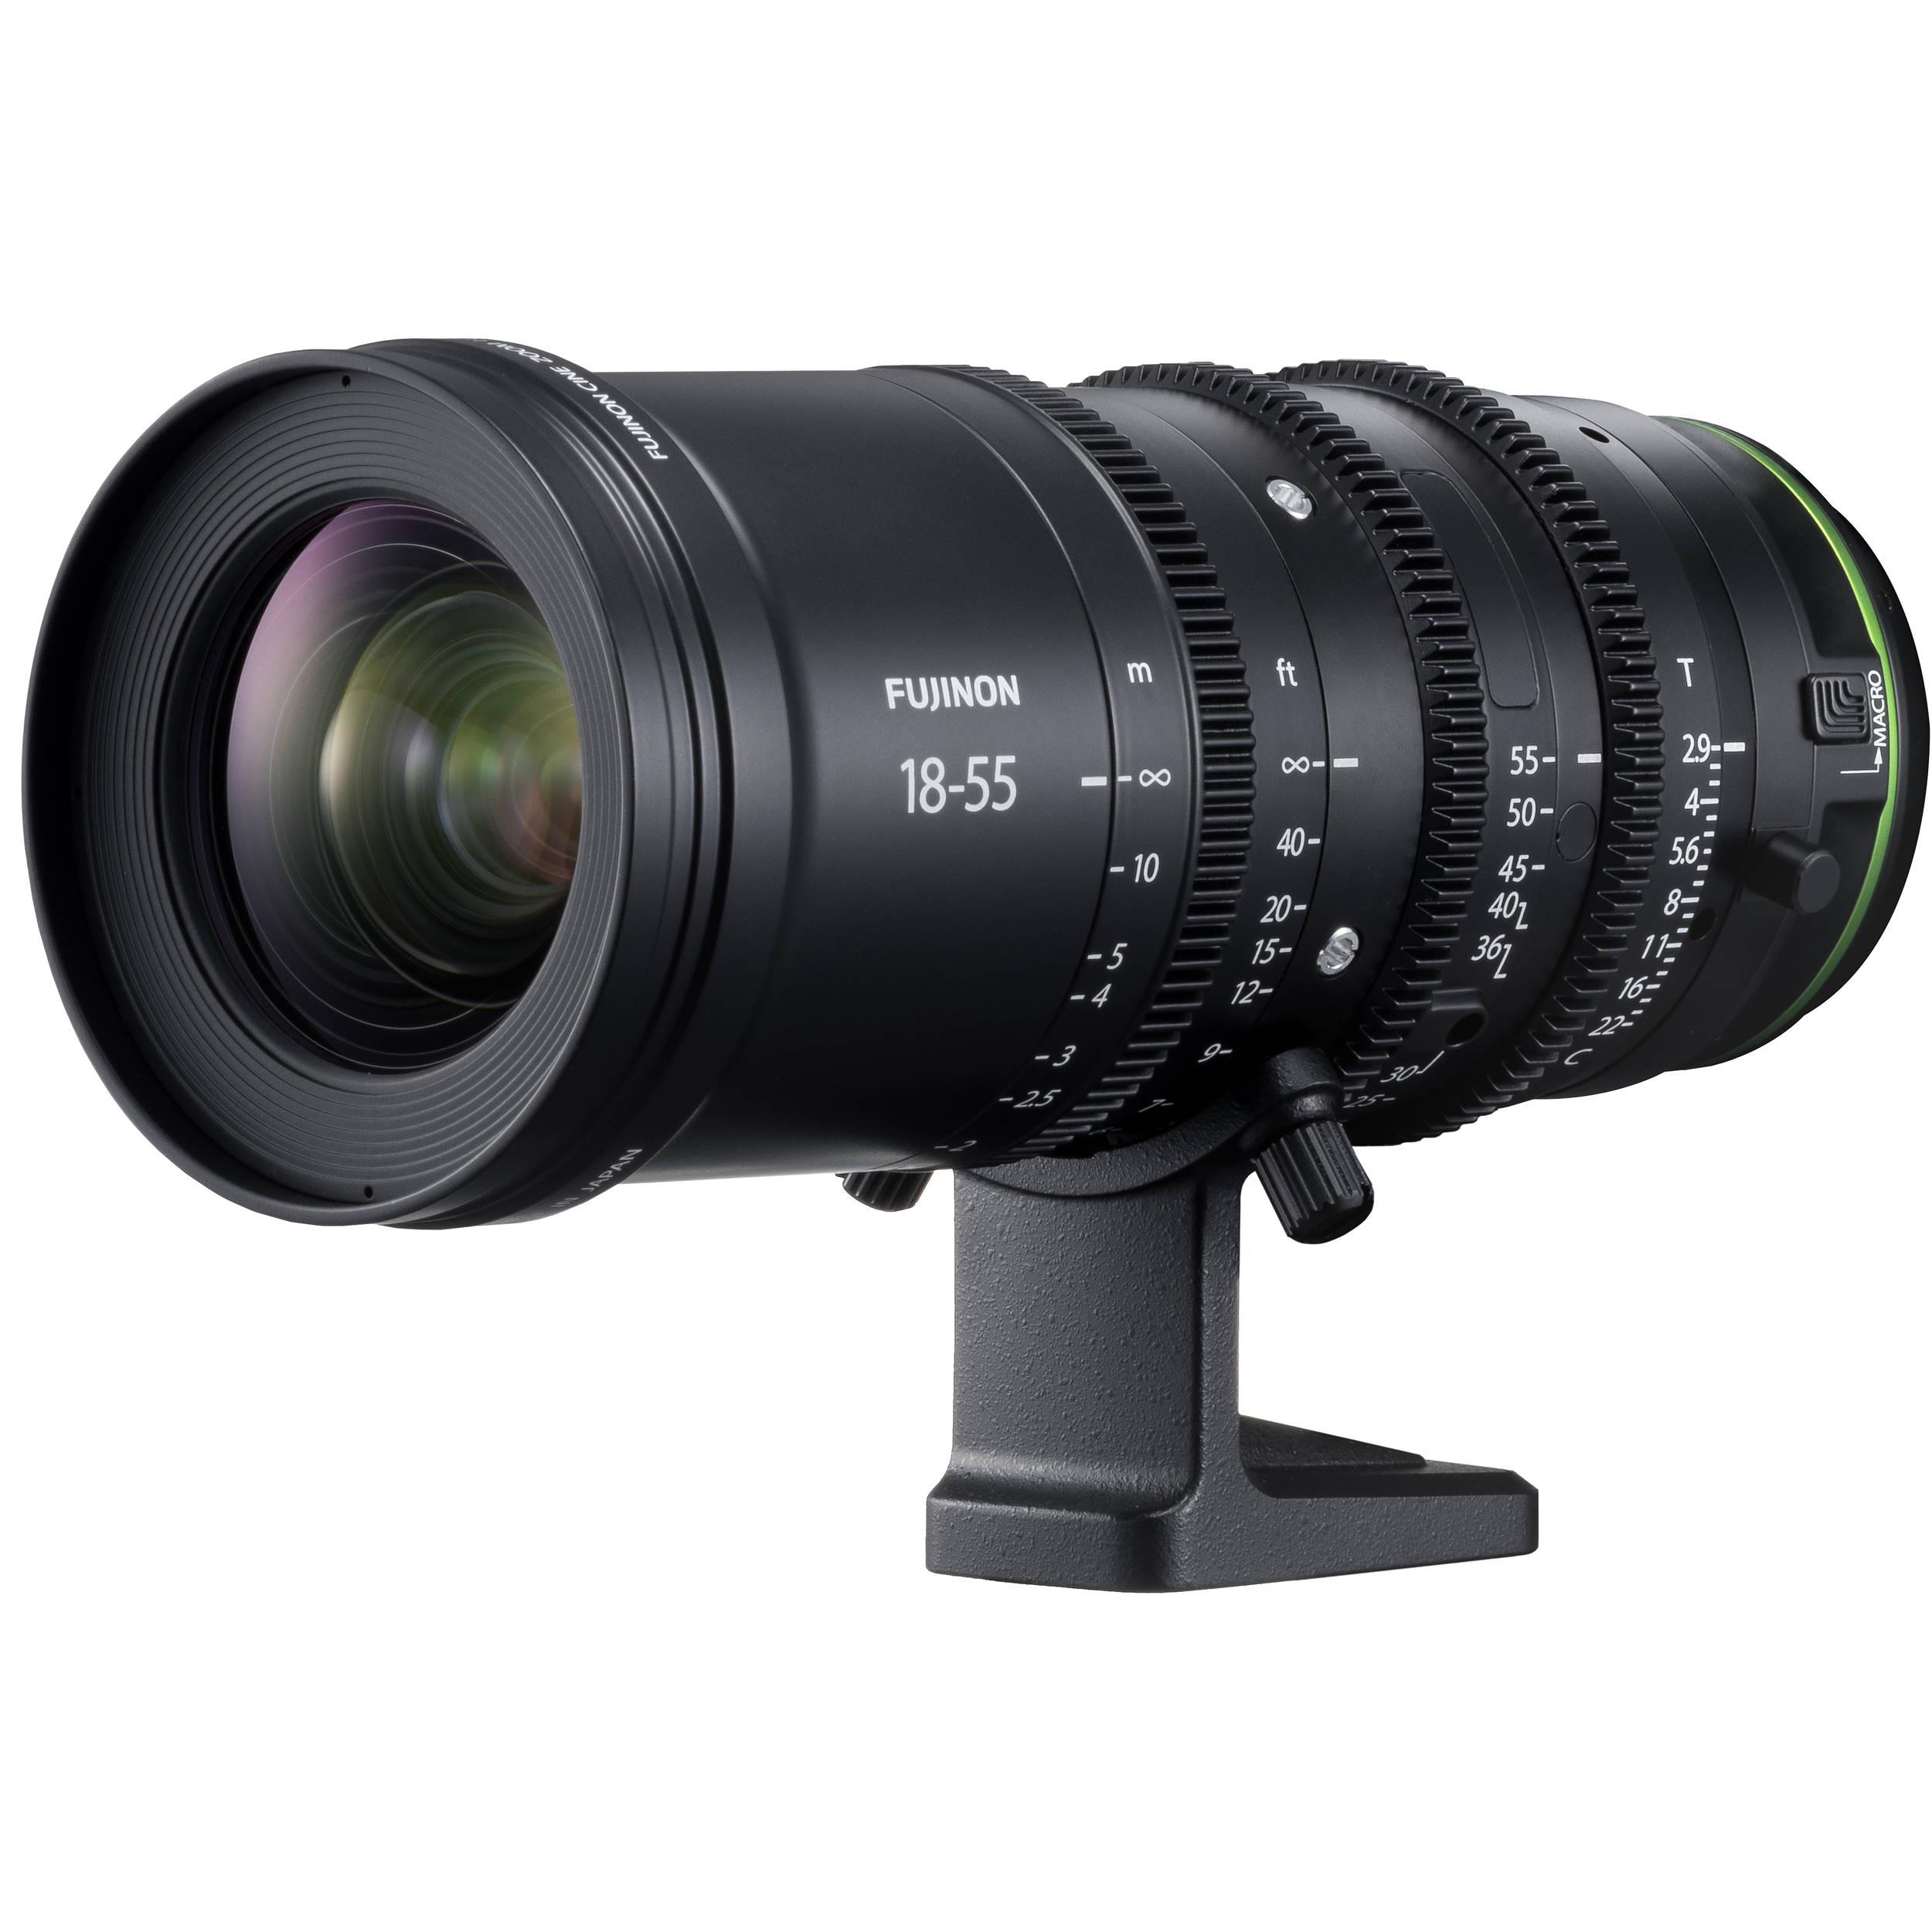 Fujinon X-T2 18-55mm F2.8-4 OIS Stabilization and Auto Focus Video Test